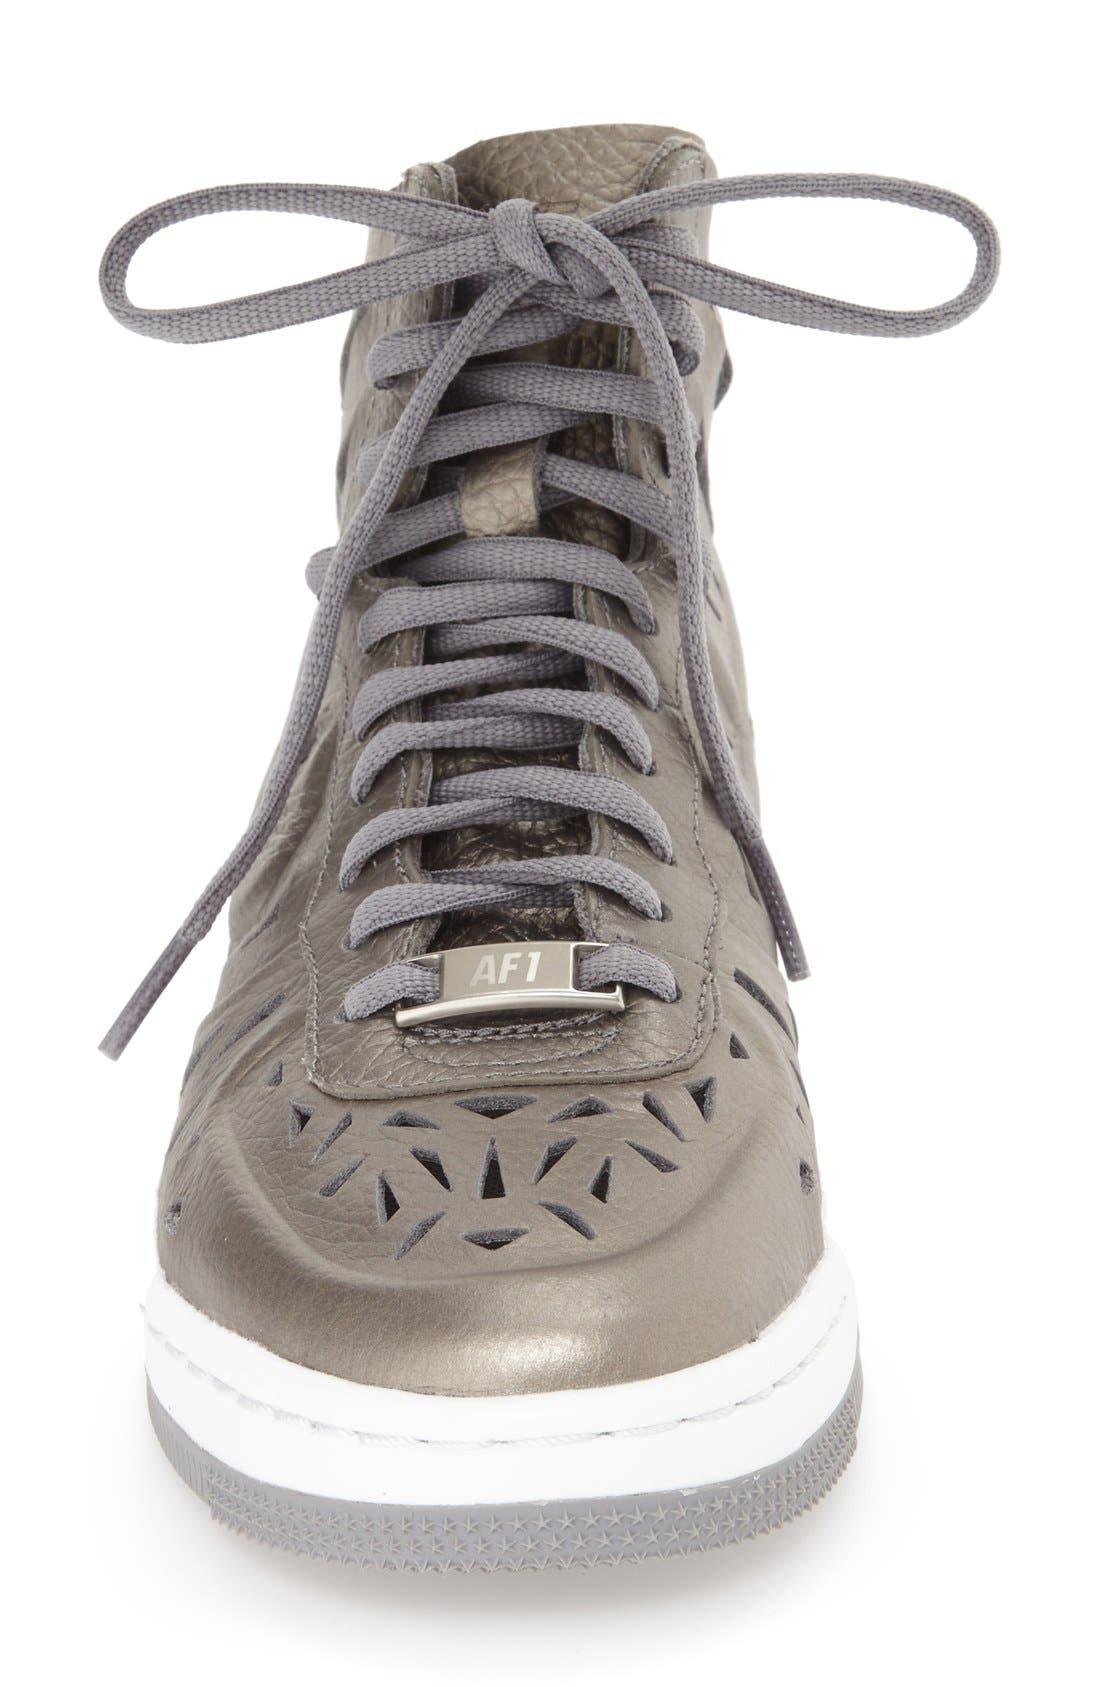 Alternate Image 3  - Nike 'Air Force 1 - Ultra Force Joli' High Top Sneaker (Women)